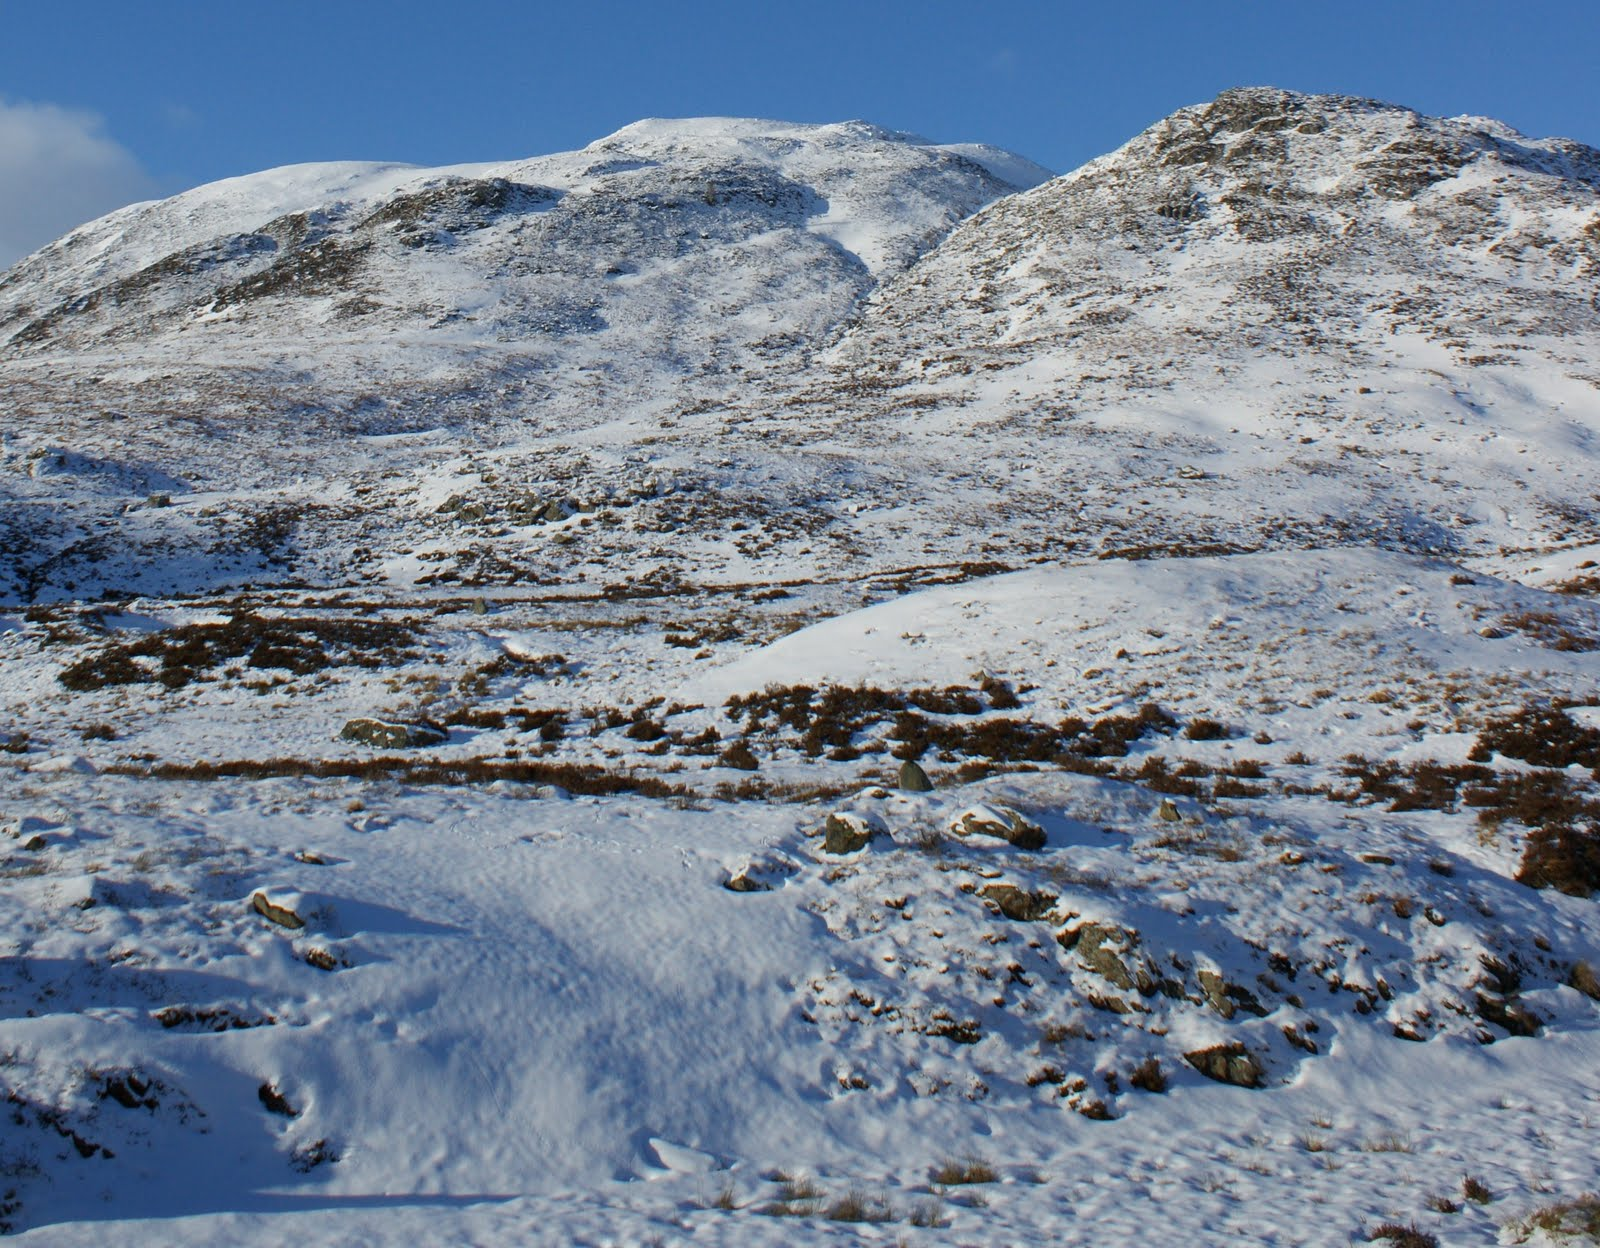 Scotland Winter Images & Pictures - Findpik